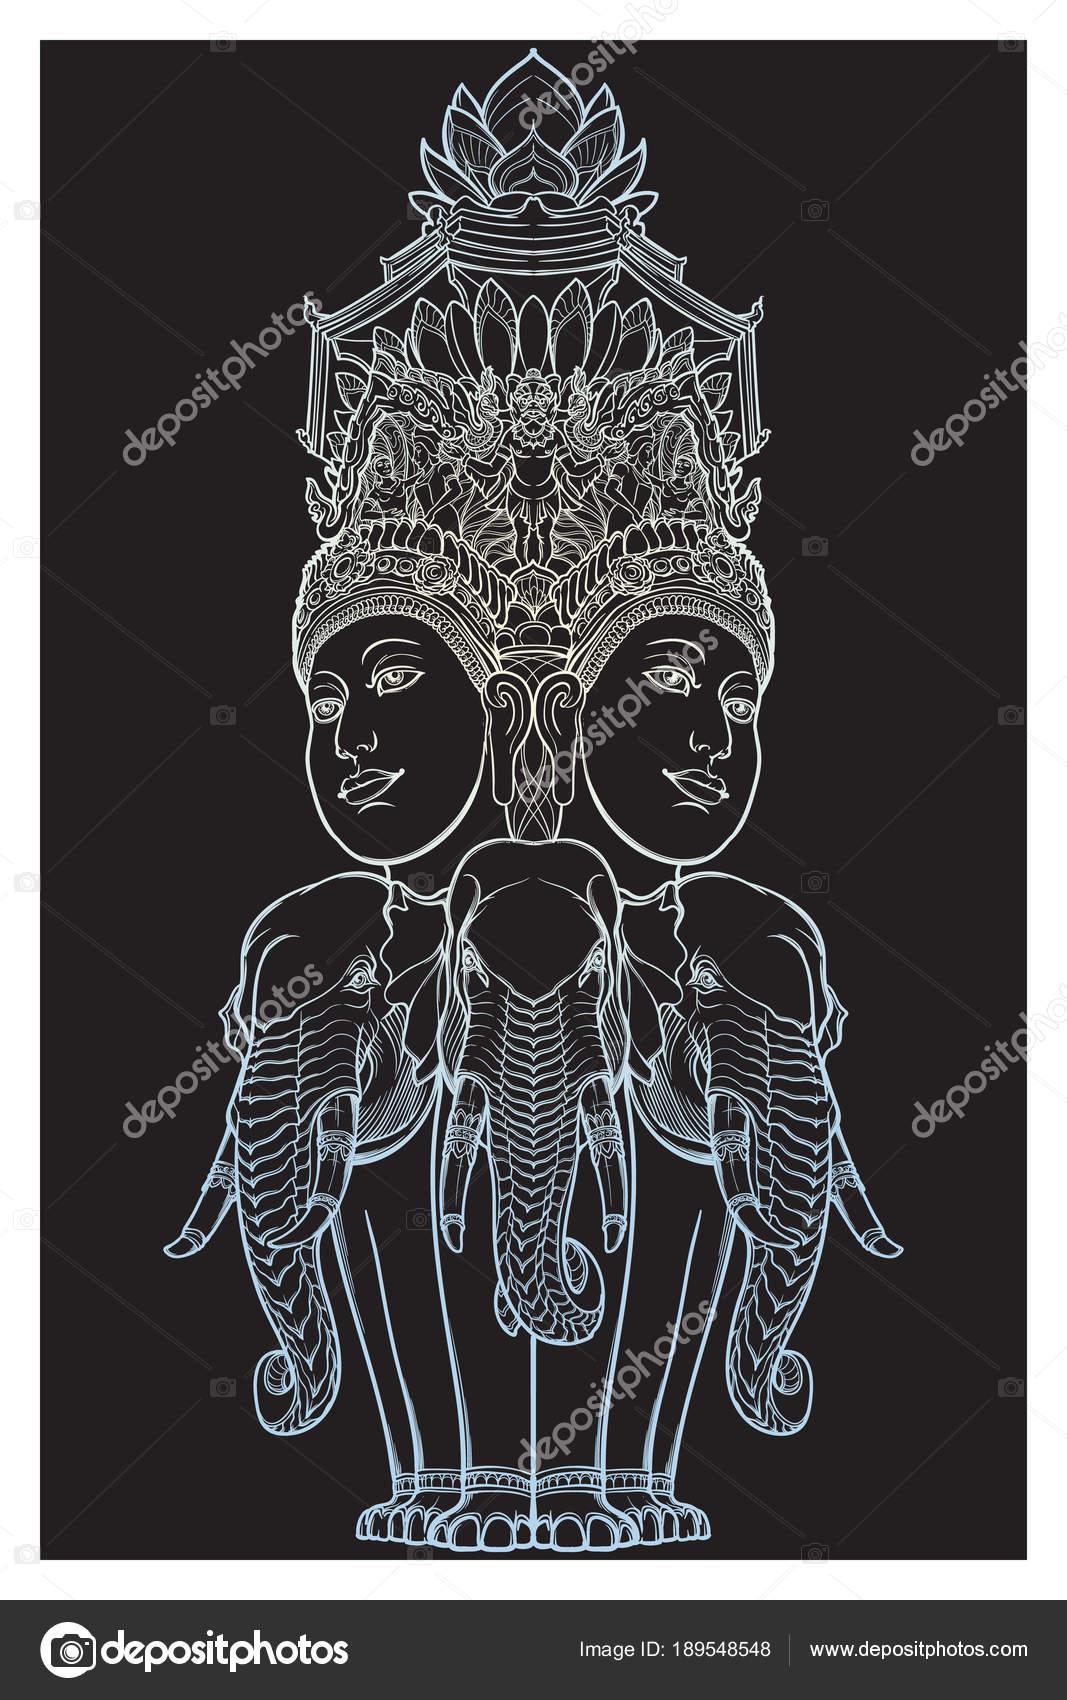 74882fda1c7c1 Statue representing Trimurti - trinity of Hindu gods Brahma, Vishnu and  Shiva, sitting on